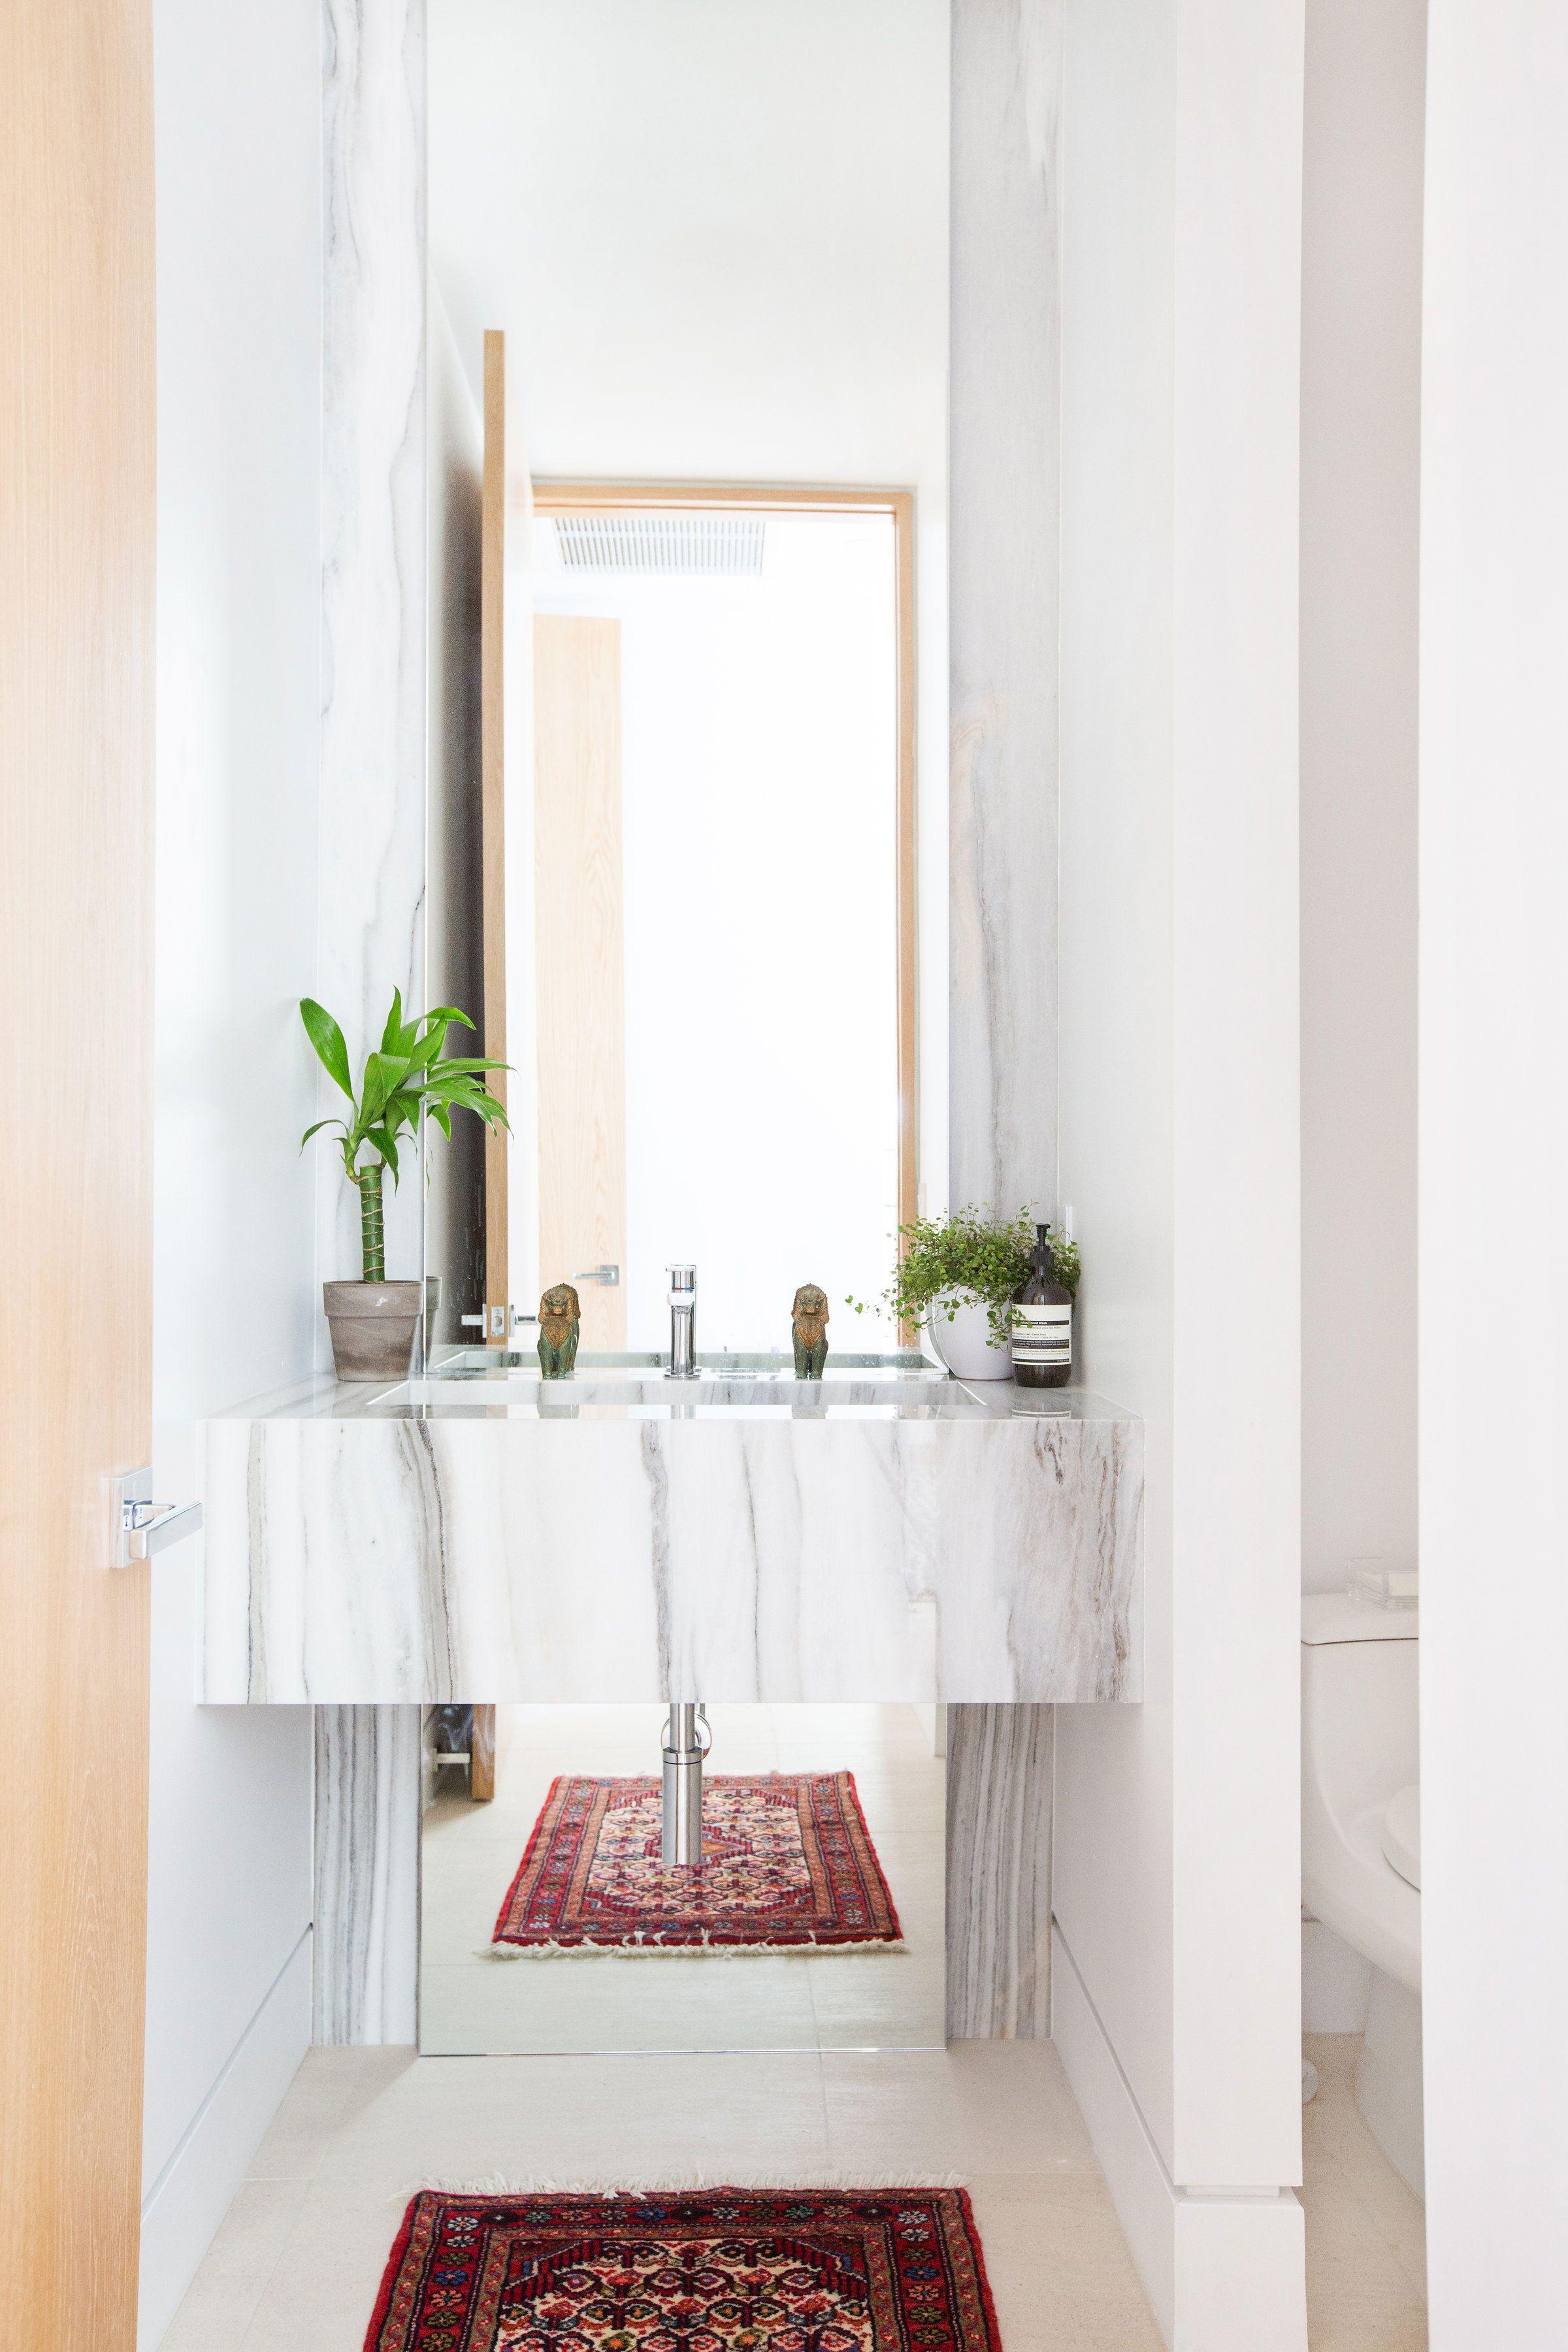 project bel air small bathroom diy bathroom decor decor on home inspirations this year the perfect dream bathrooms diy bathroom ideas id=91623